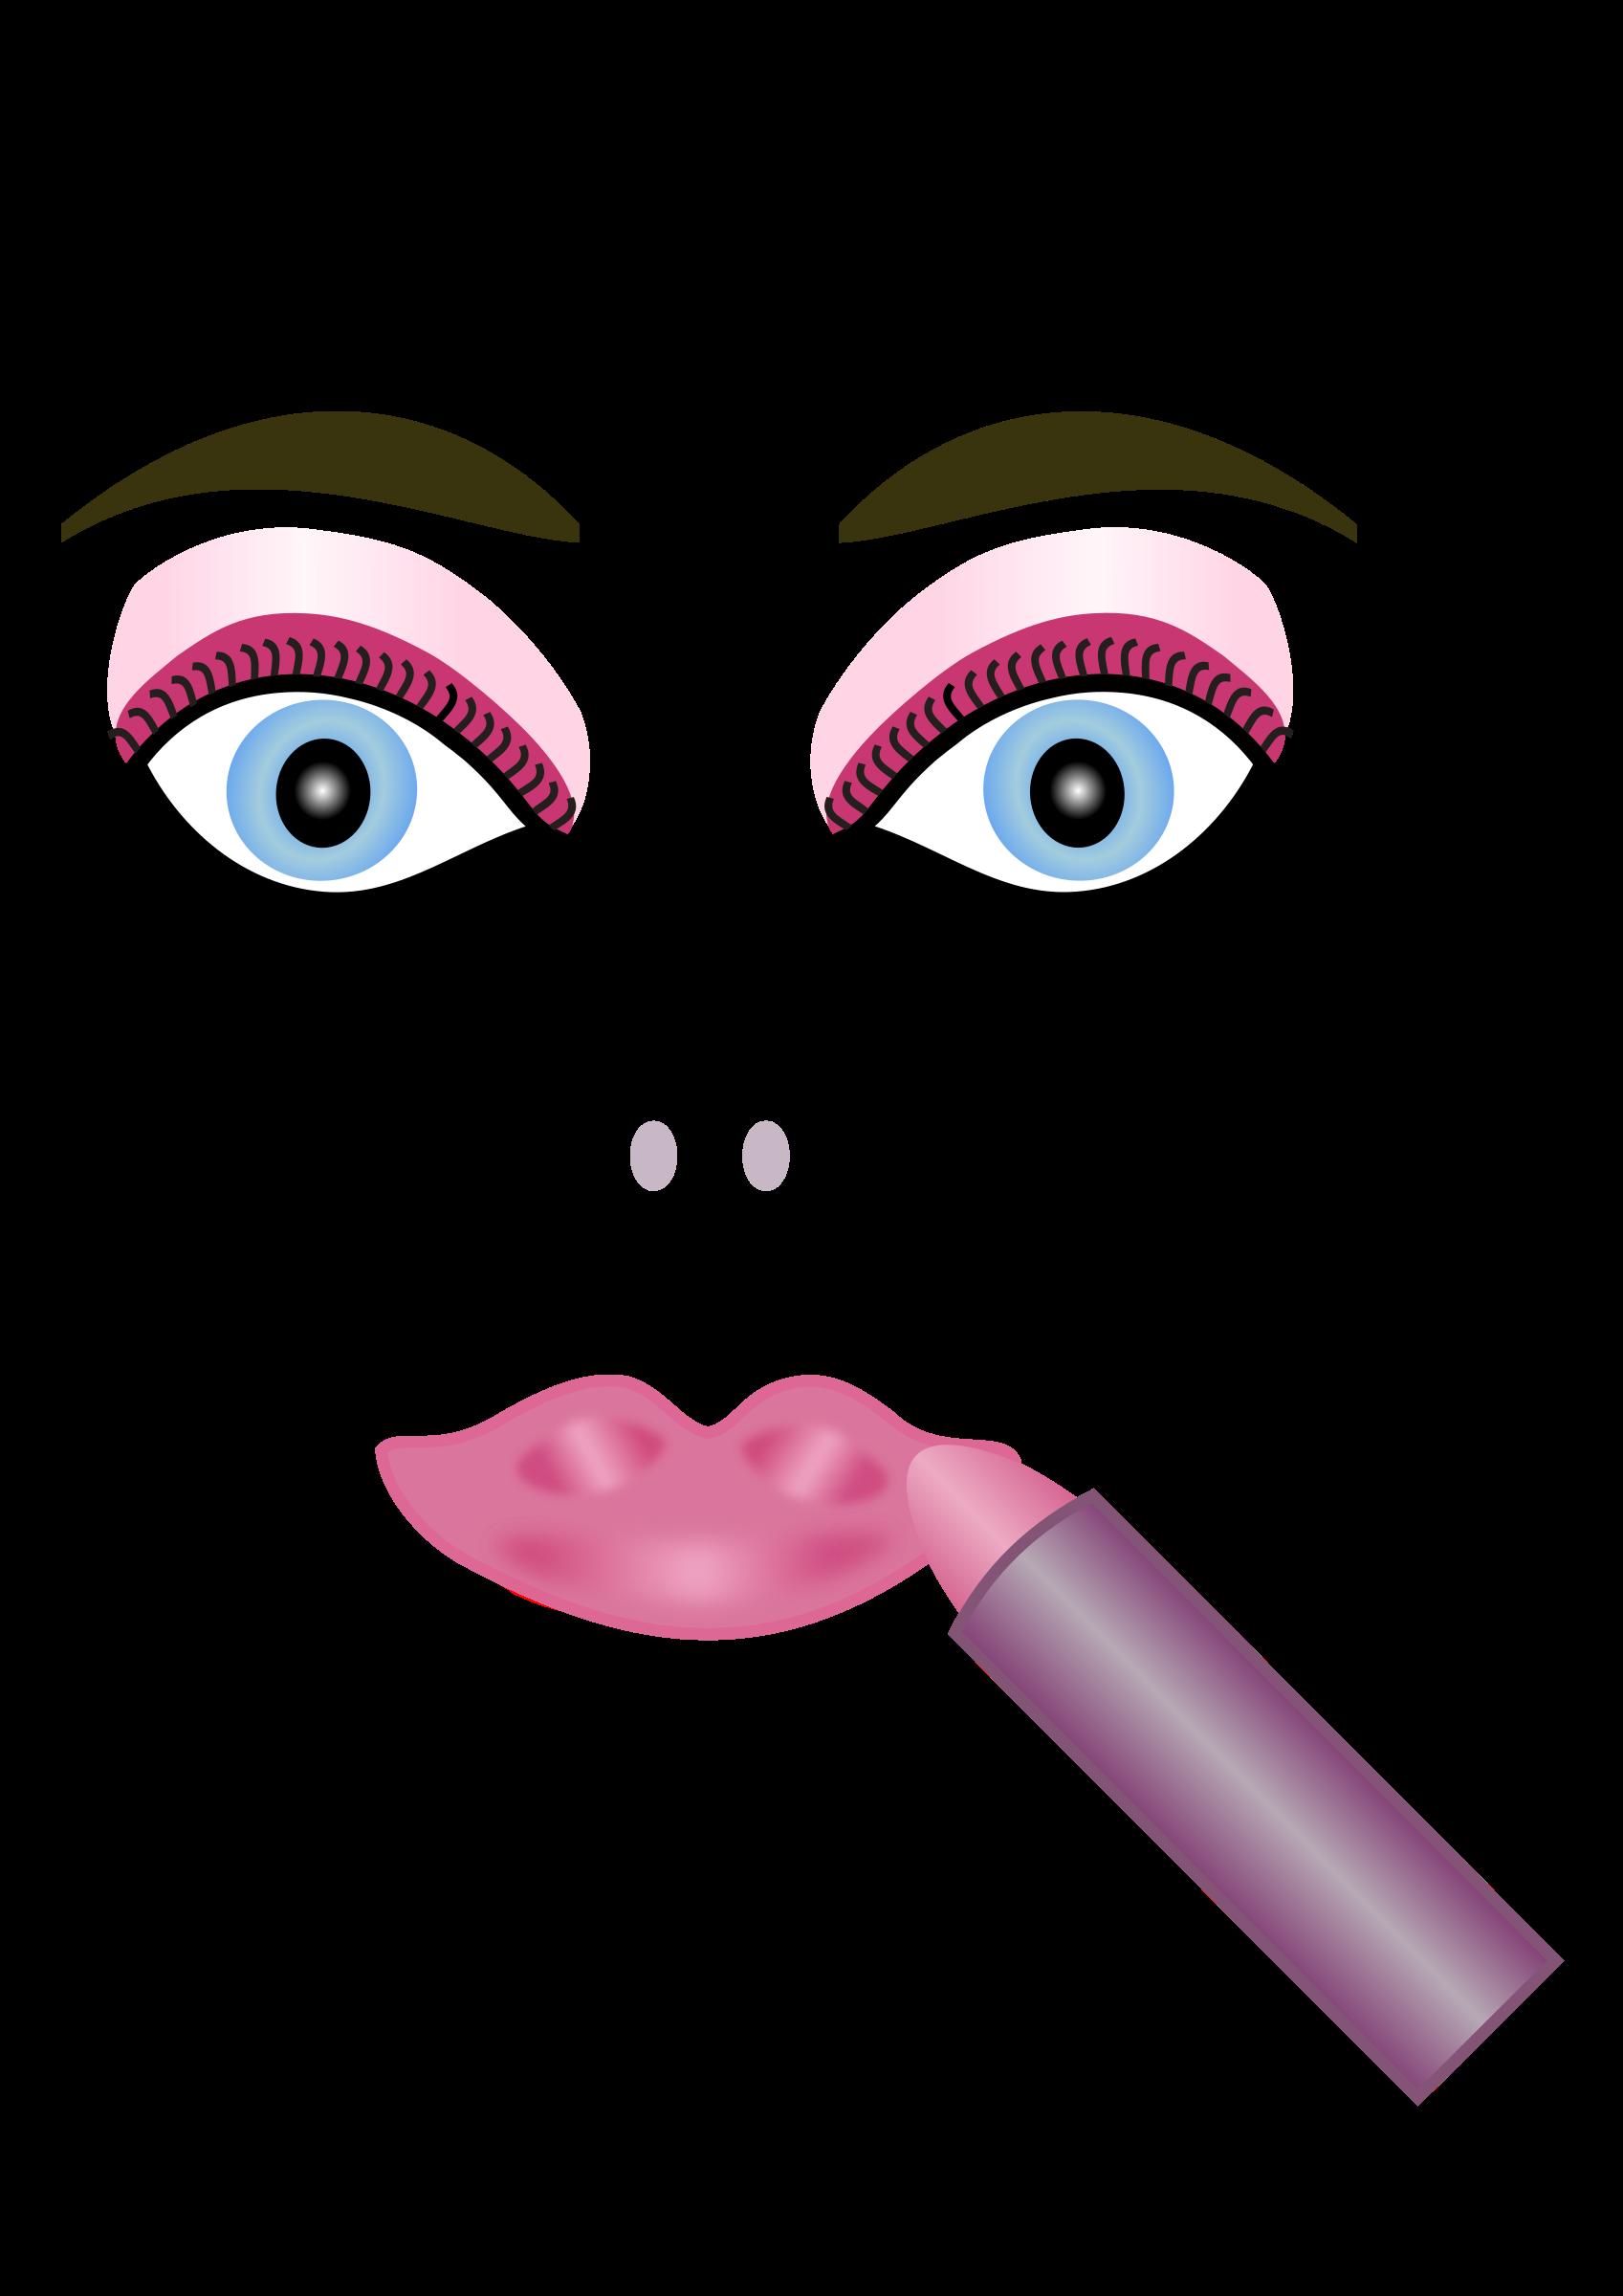 Big image png. Costume clipart makeup